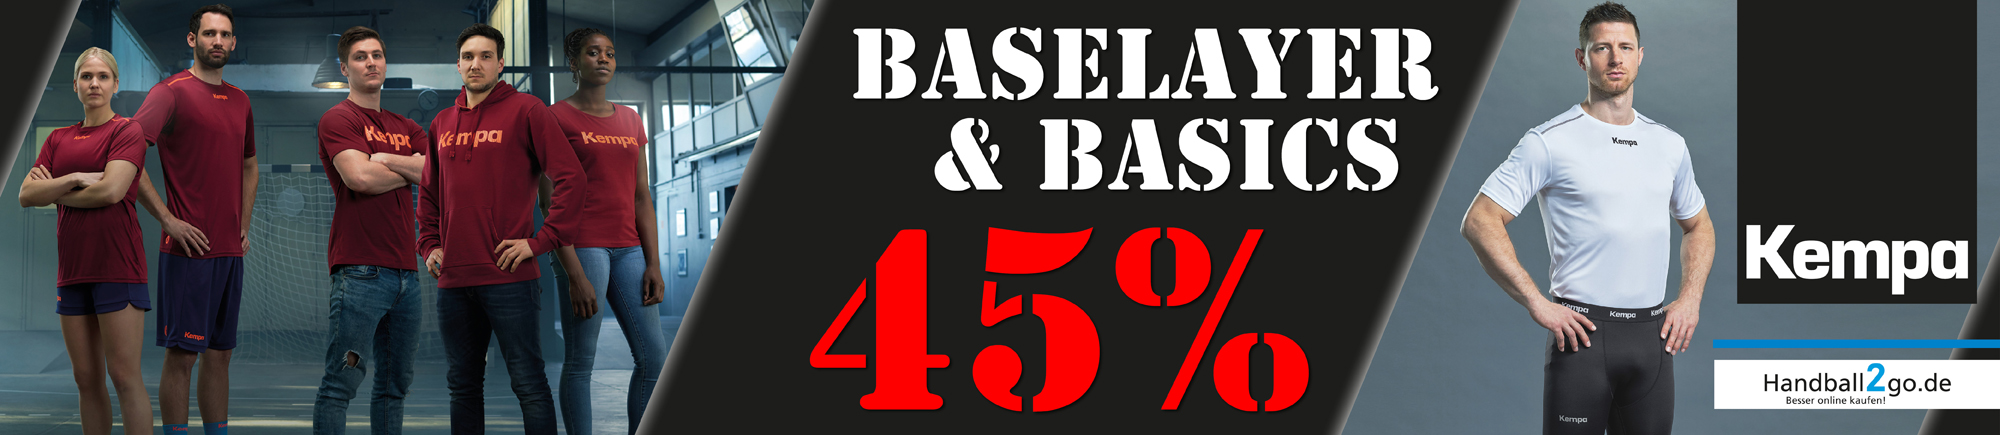 Kempa Baselayer & Basics